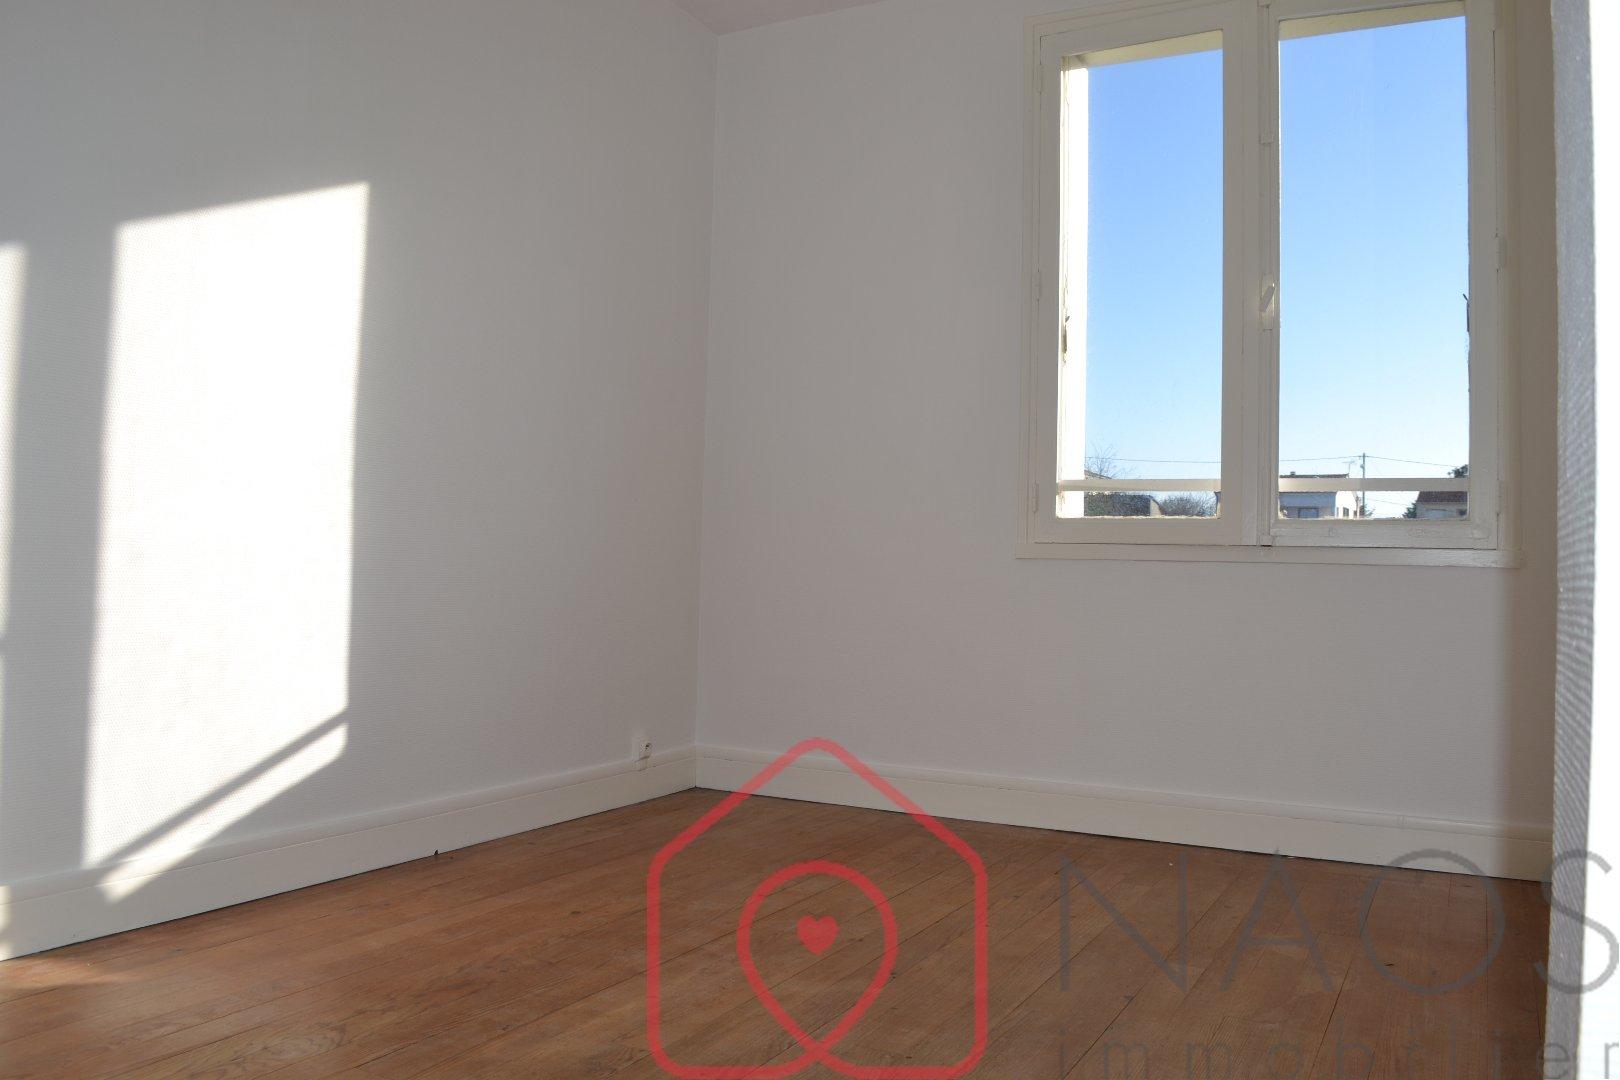 vente appartement 4 pièces ROCHEFORT 17300